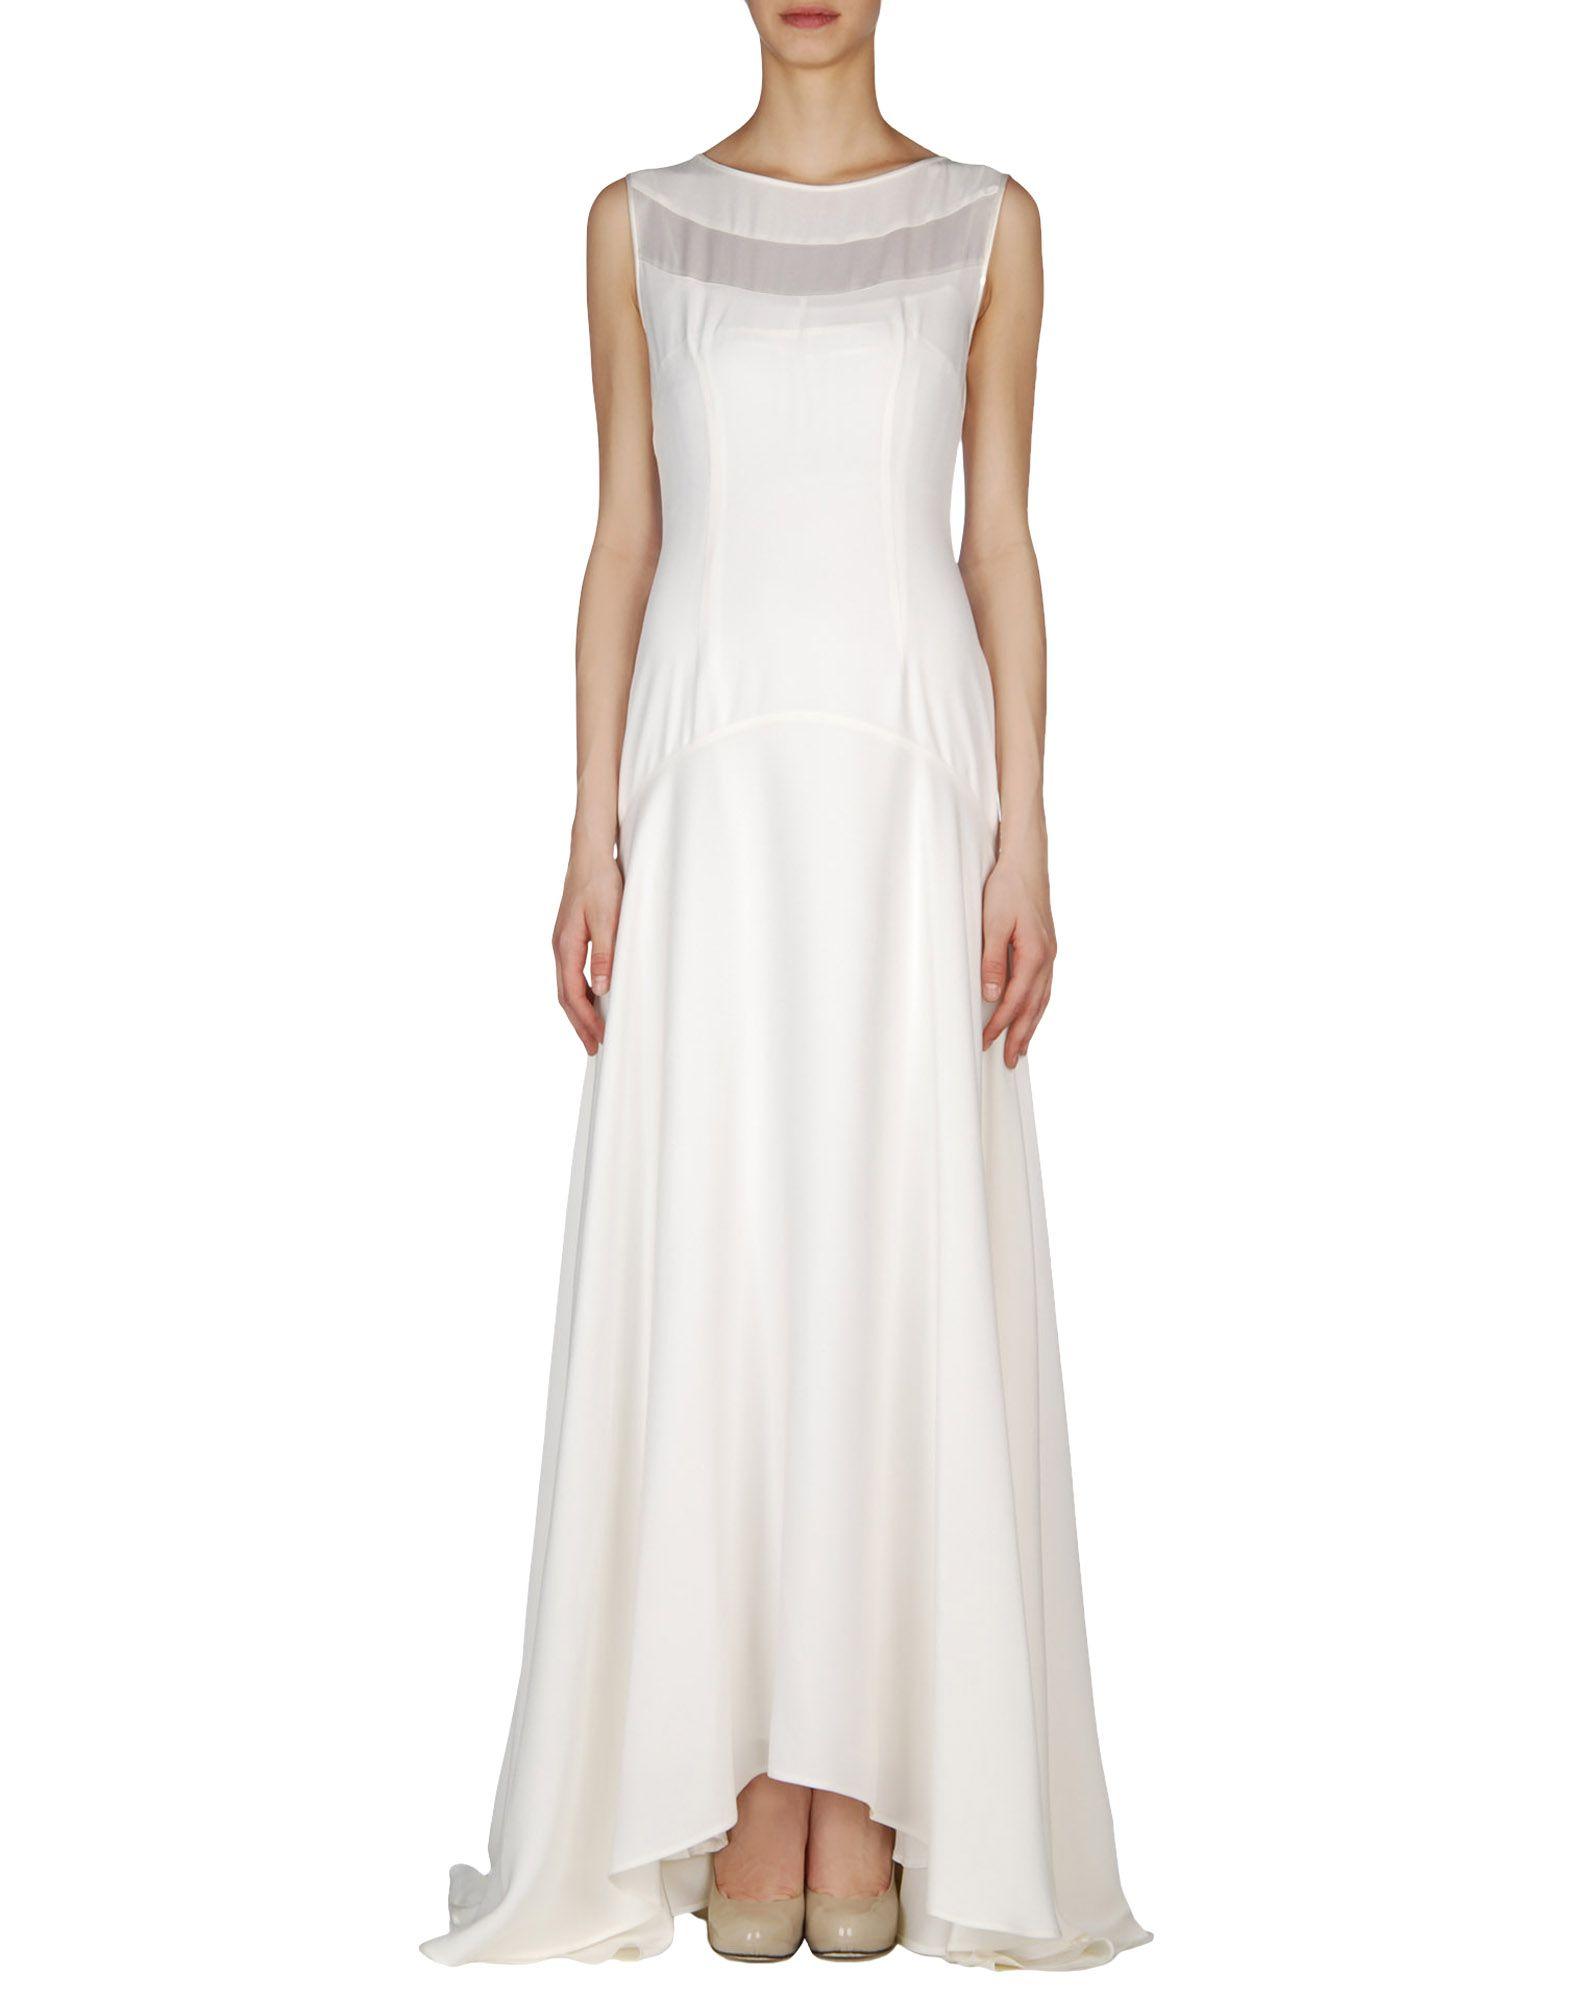 Shoeniverse dress week part 2 feat the ultimate wedding for Dolce gabbana wedding dress